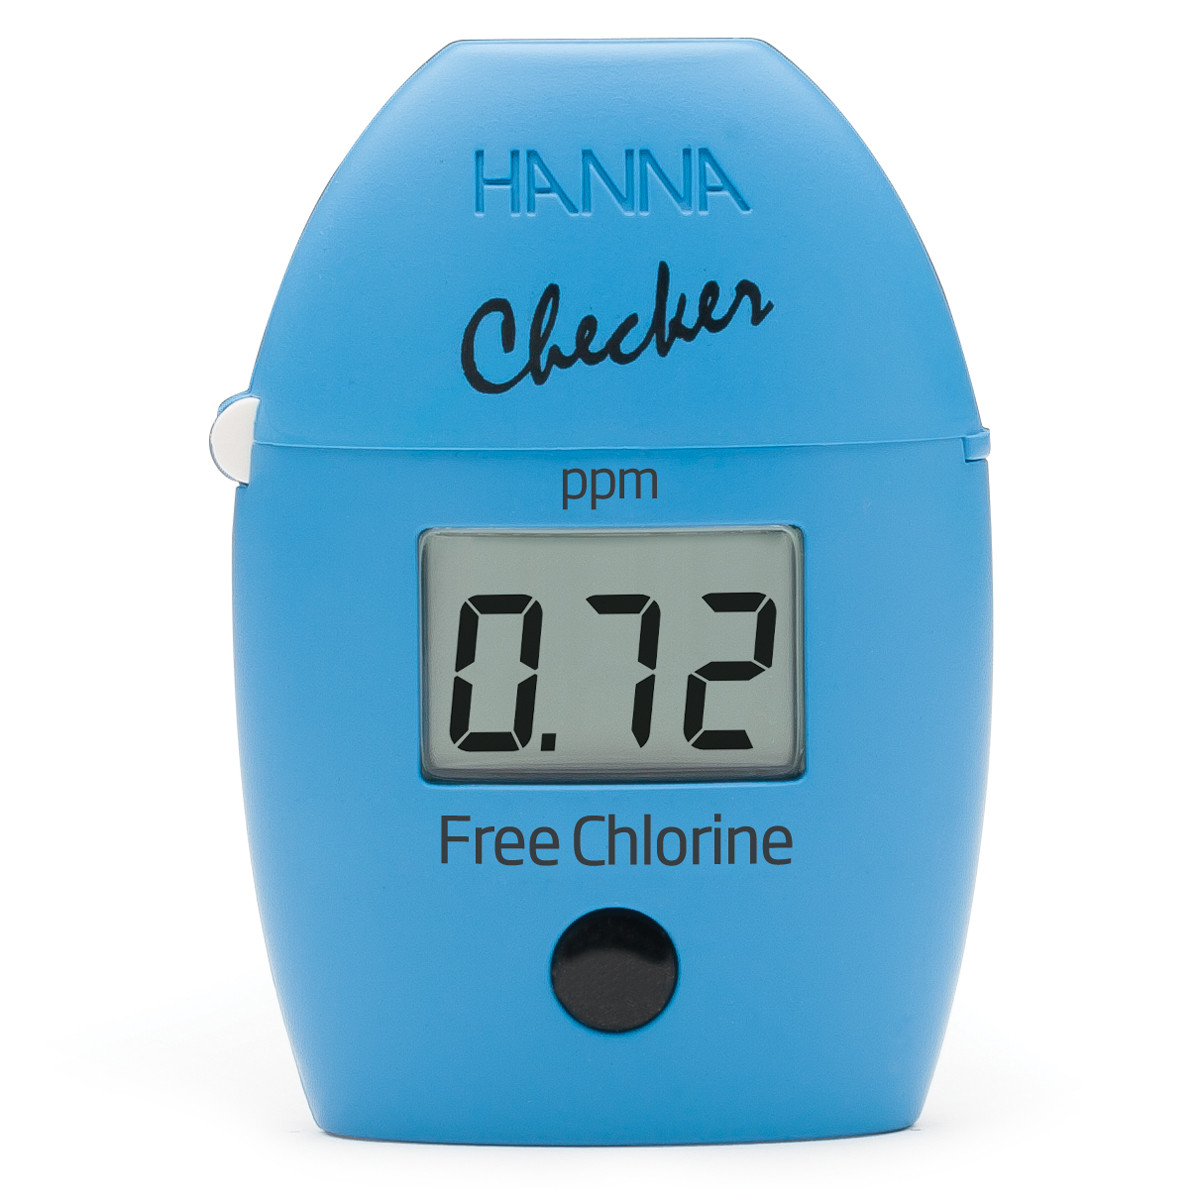 Free Chlorine Colorimeter - Checker® HC